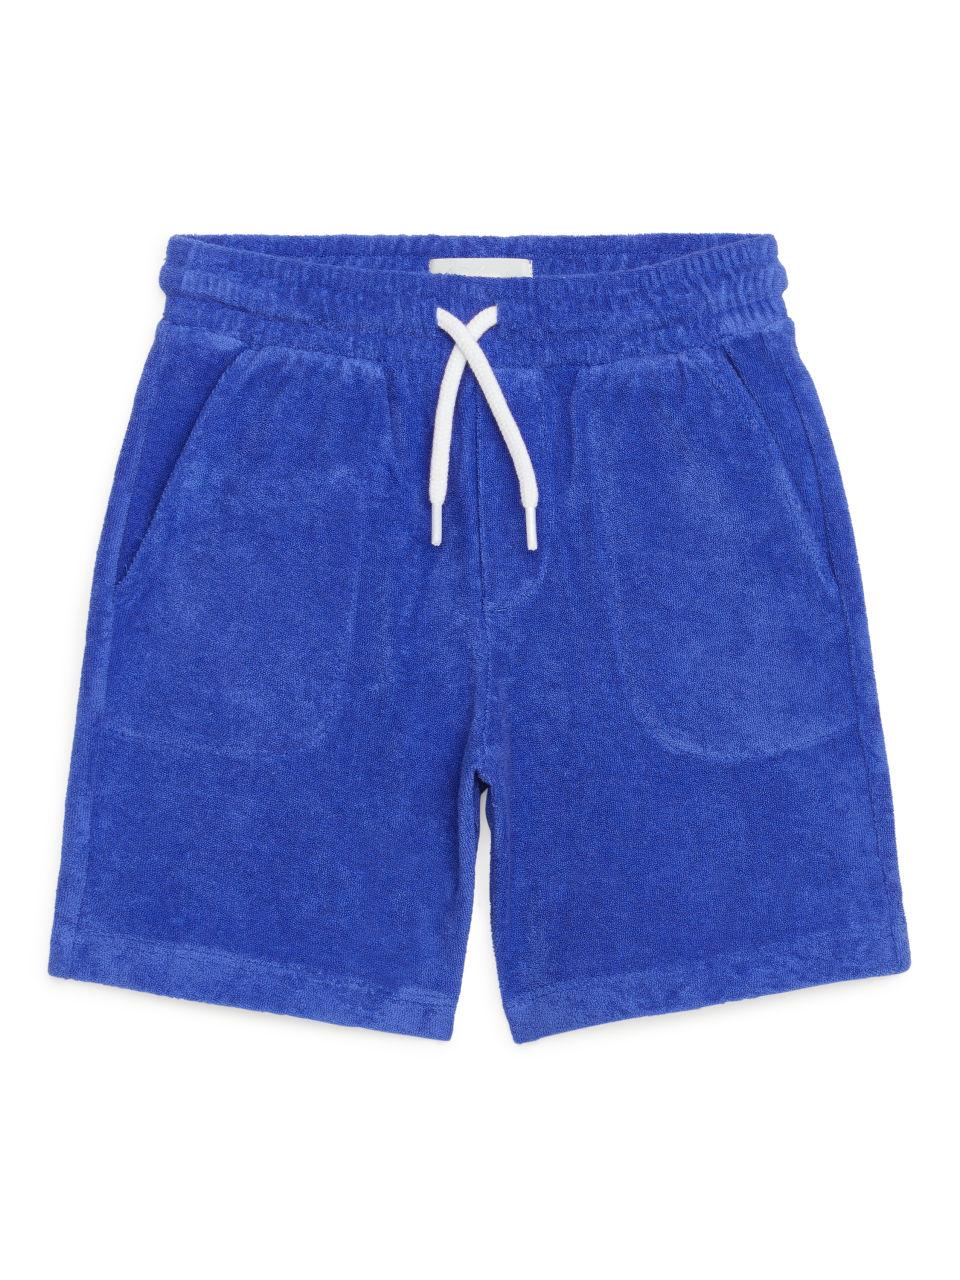 Cotton Towelling Shorts - Blue